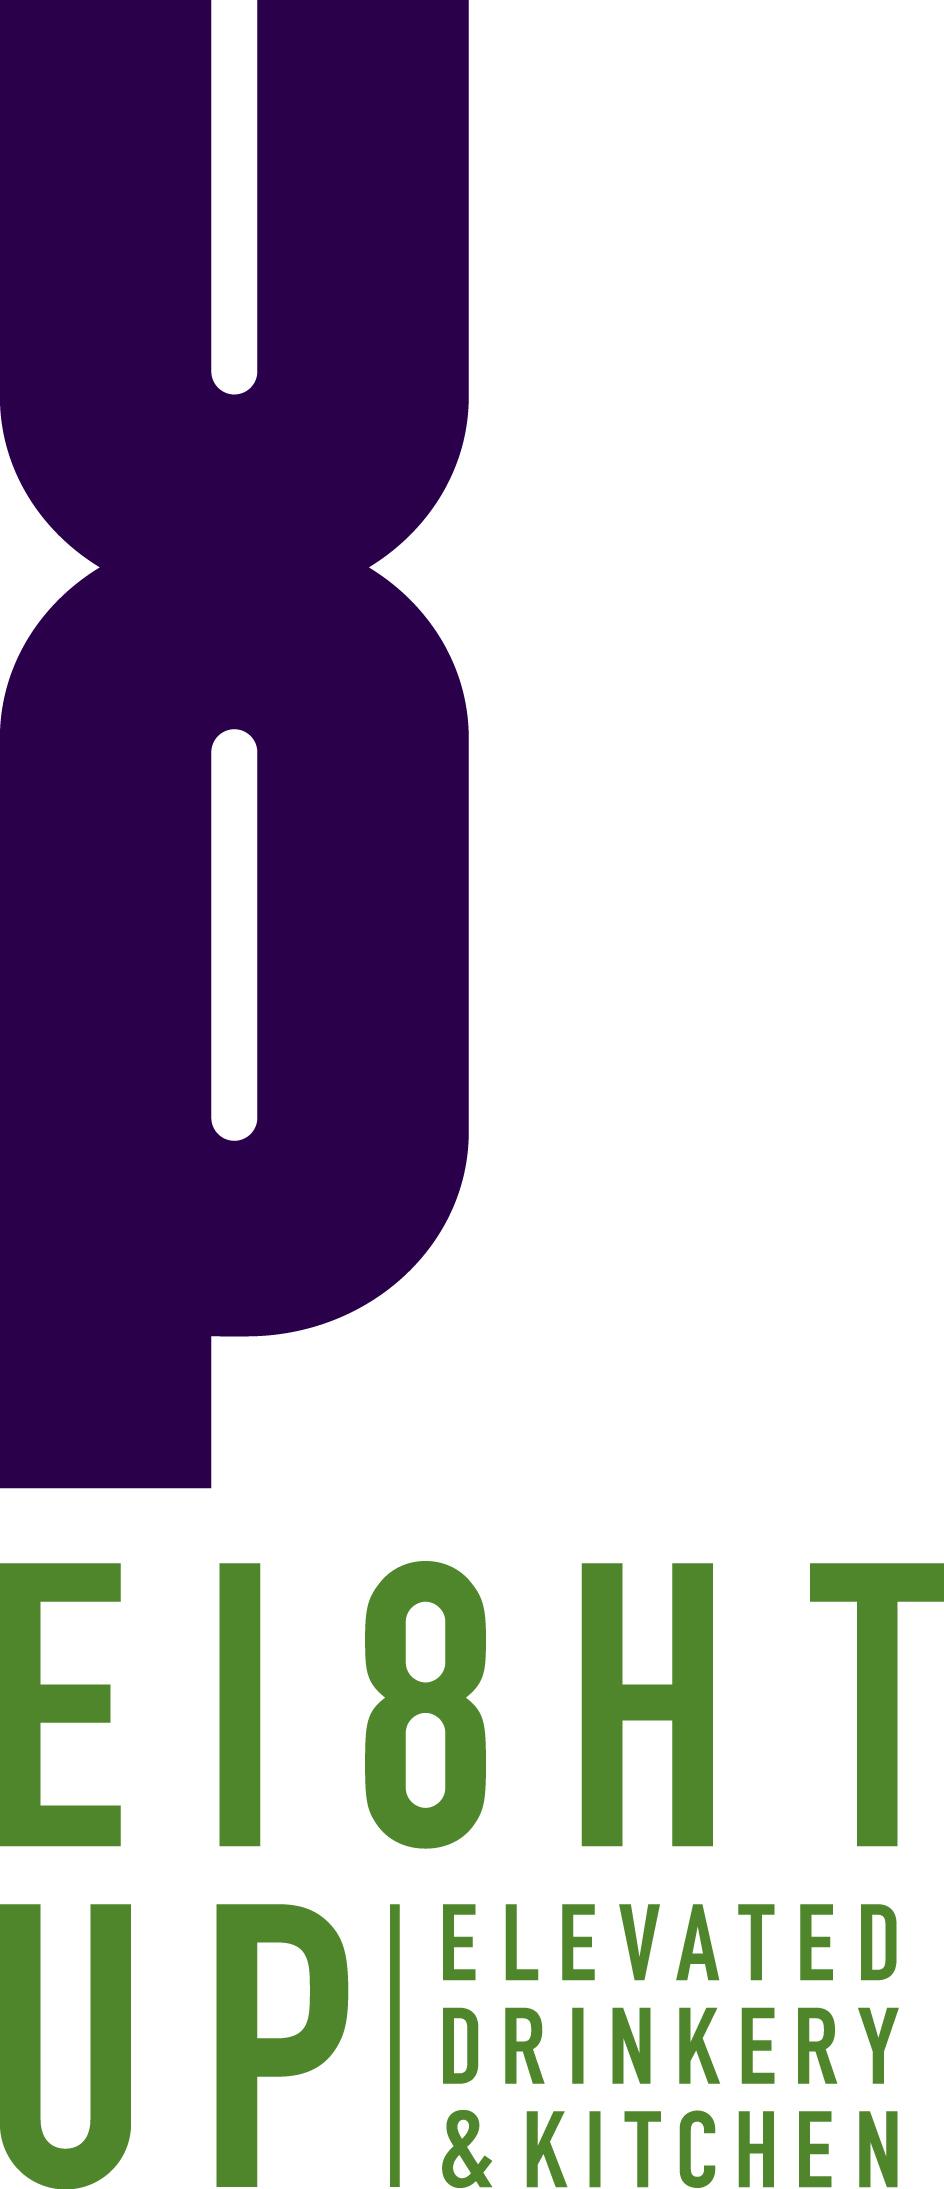 8 UP PAYROLL, LLC